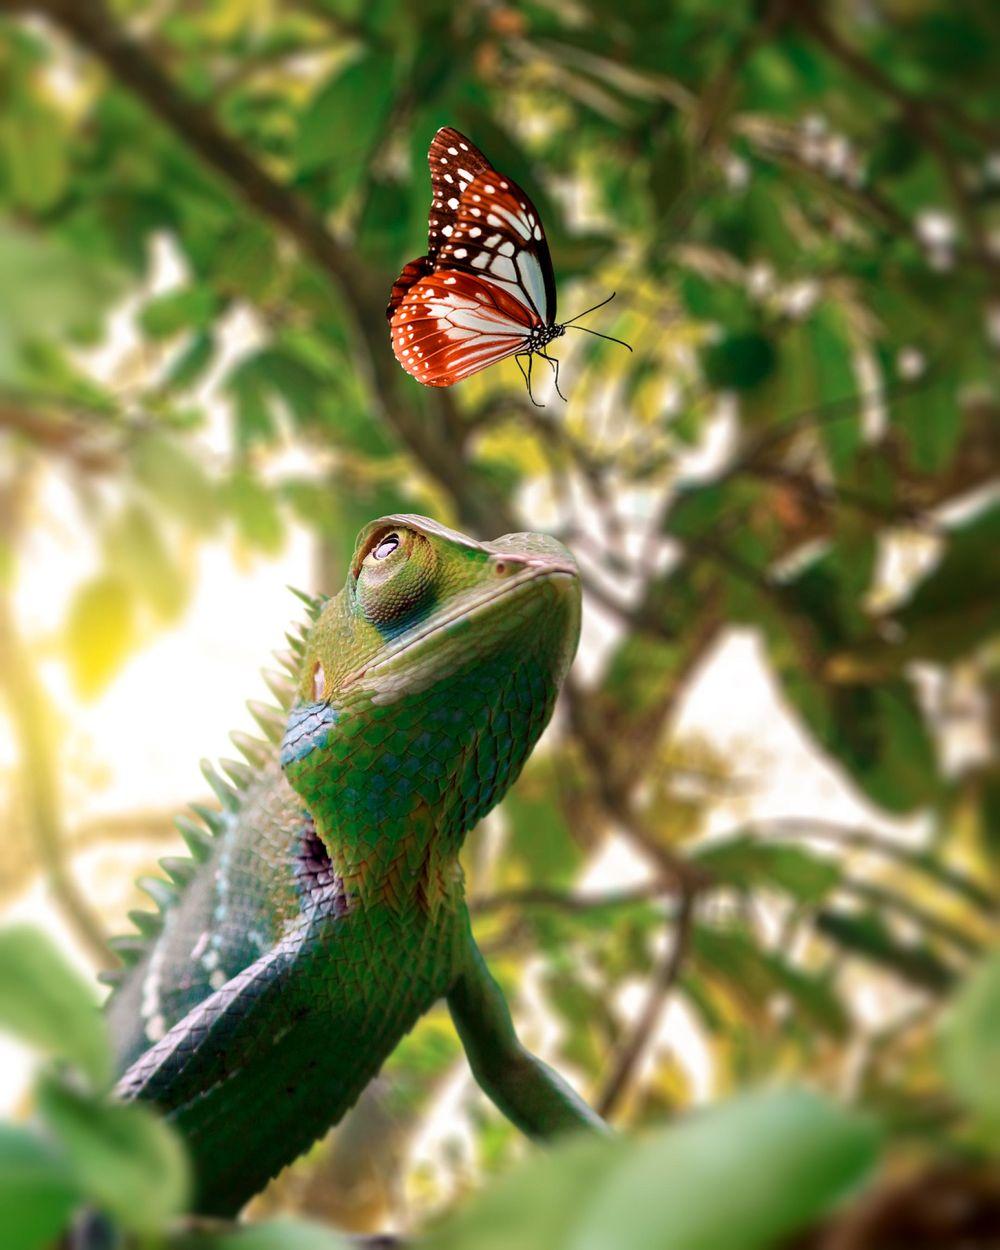 Photorealistic Chameleon - image 1 - student project